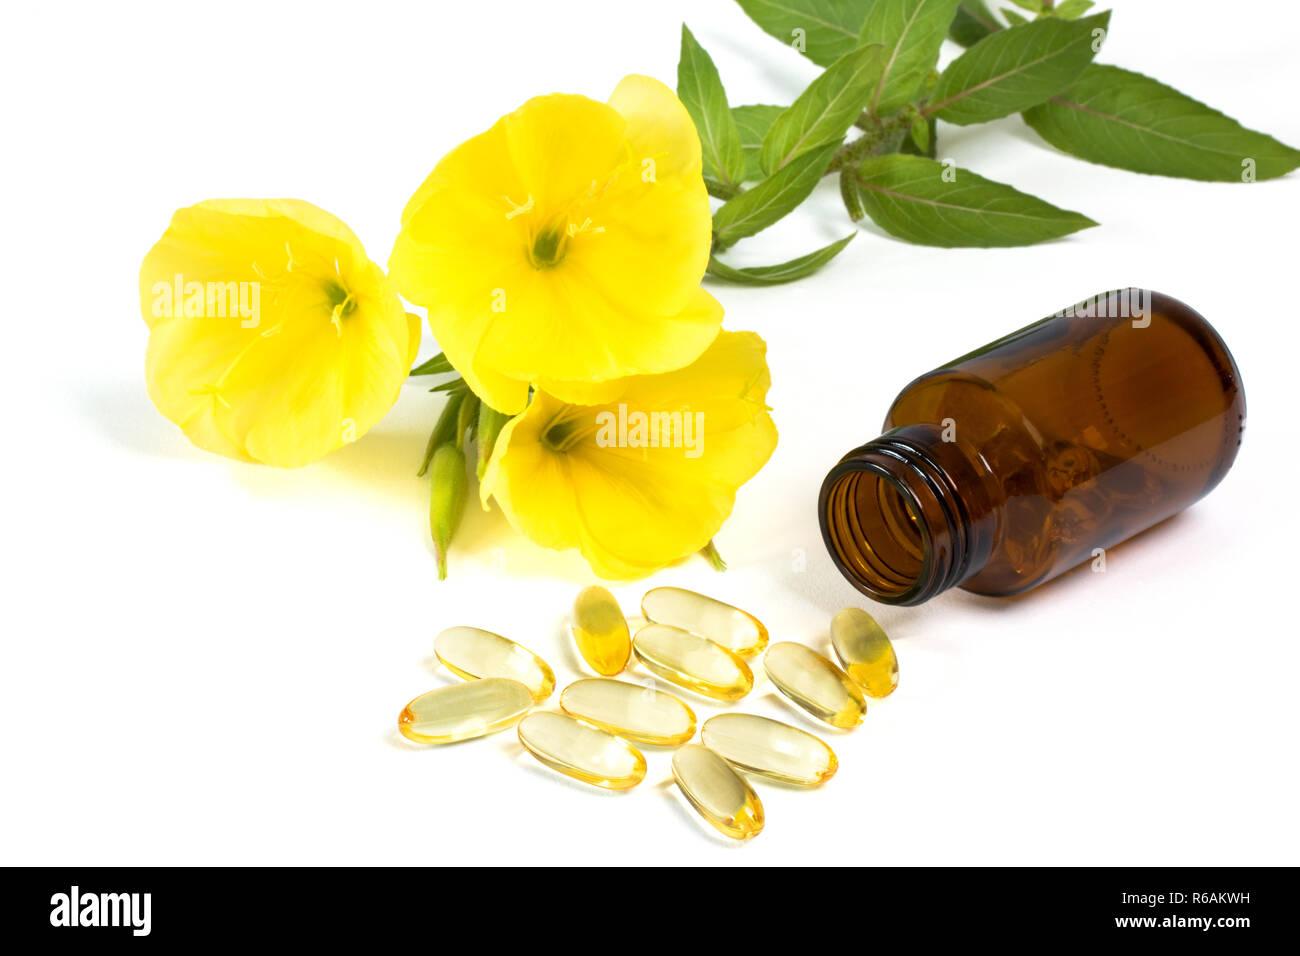 Gelatin Capsules With Evening Primroses And Medicine Bottle On White Background Stock Photo